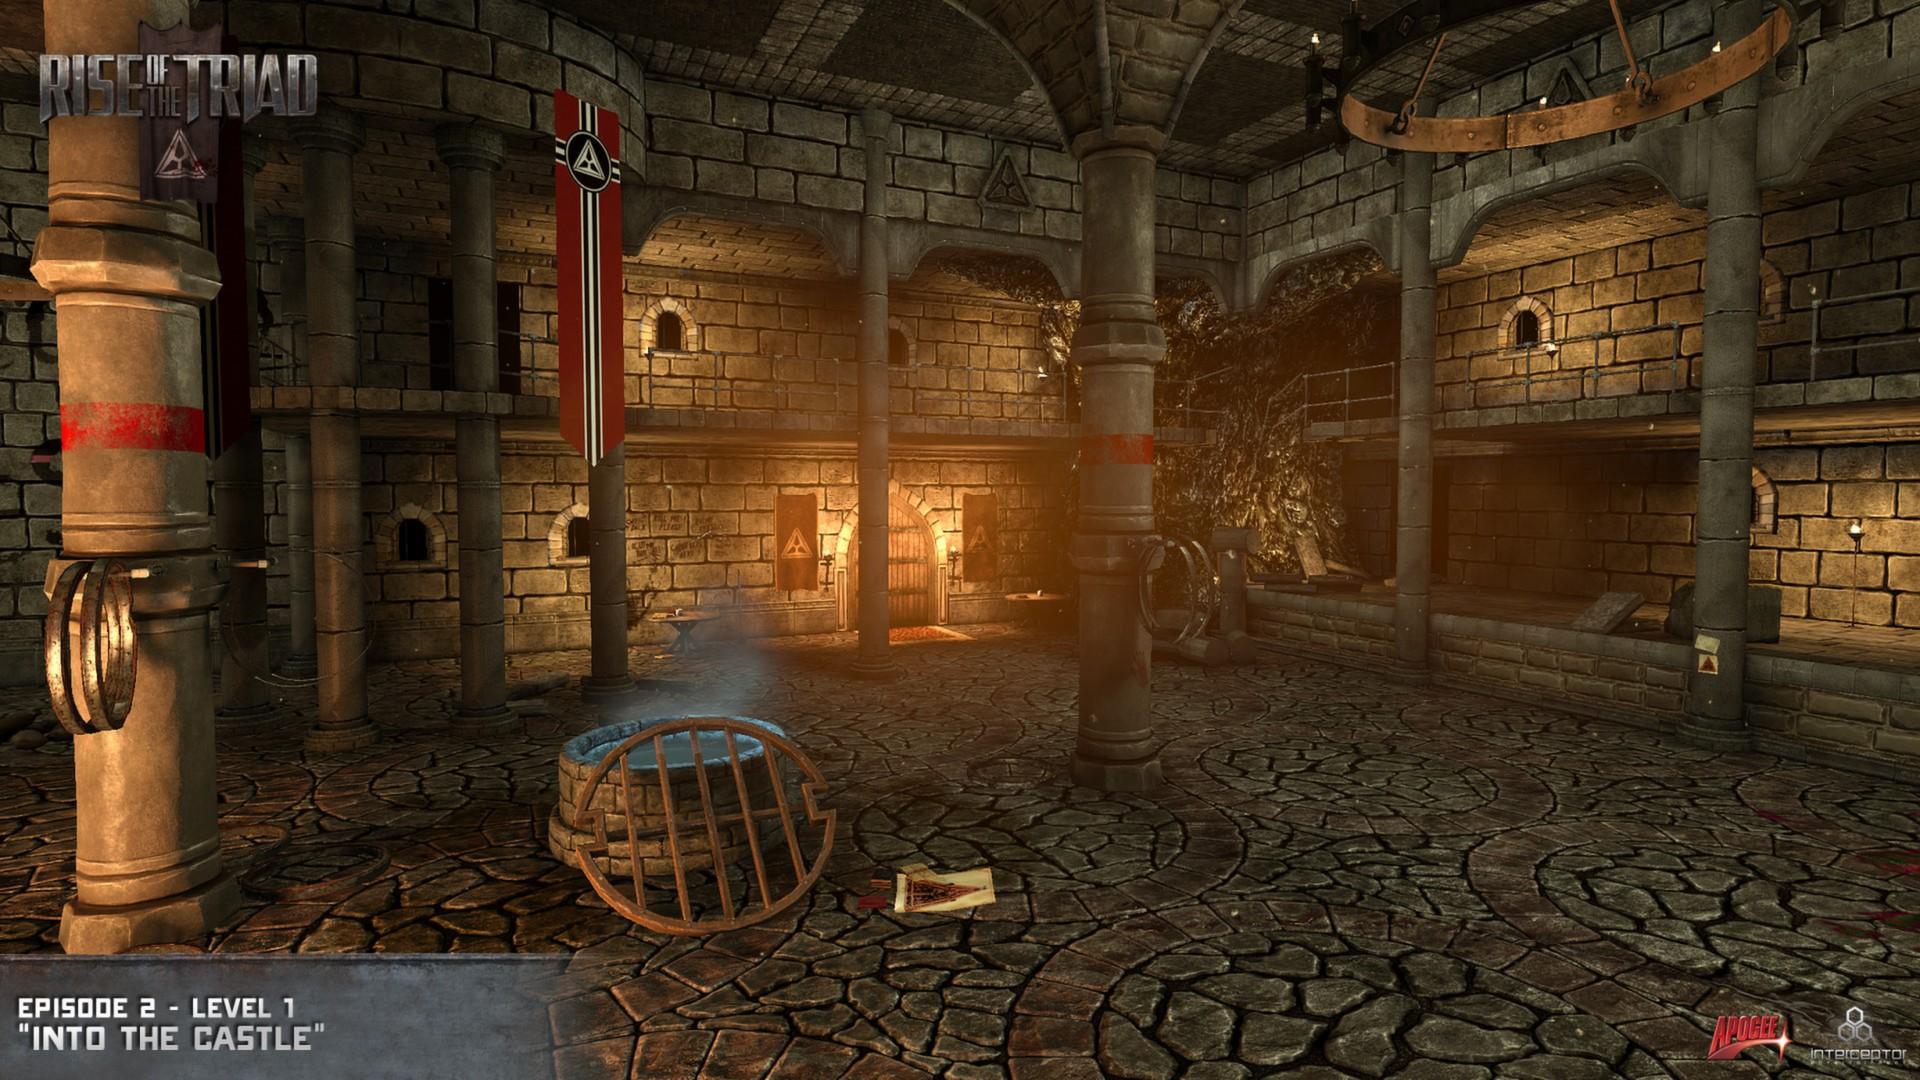 Rise of the Triad (2013) screenshot 1